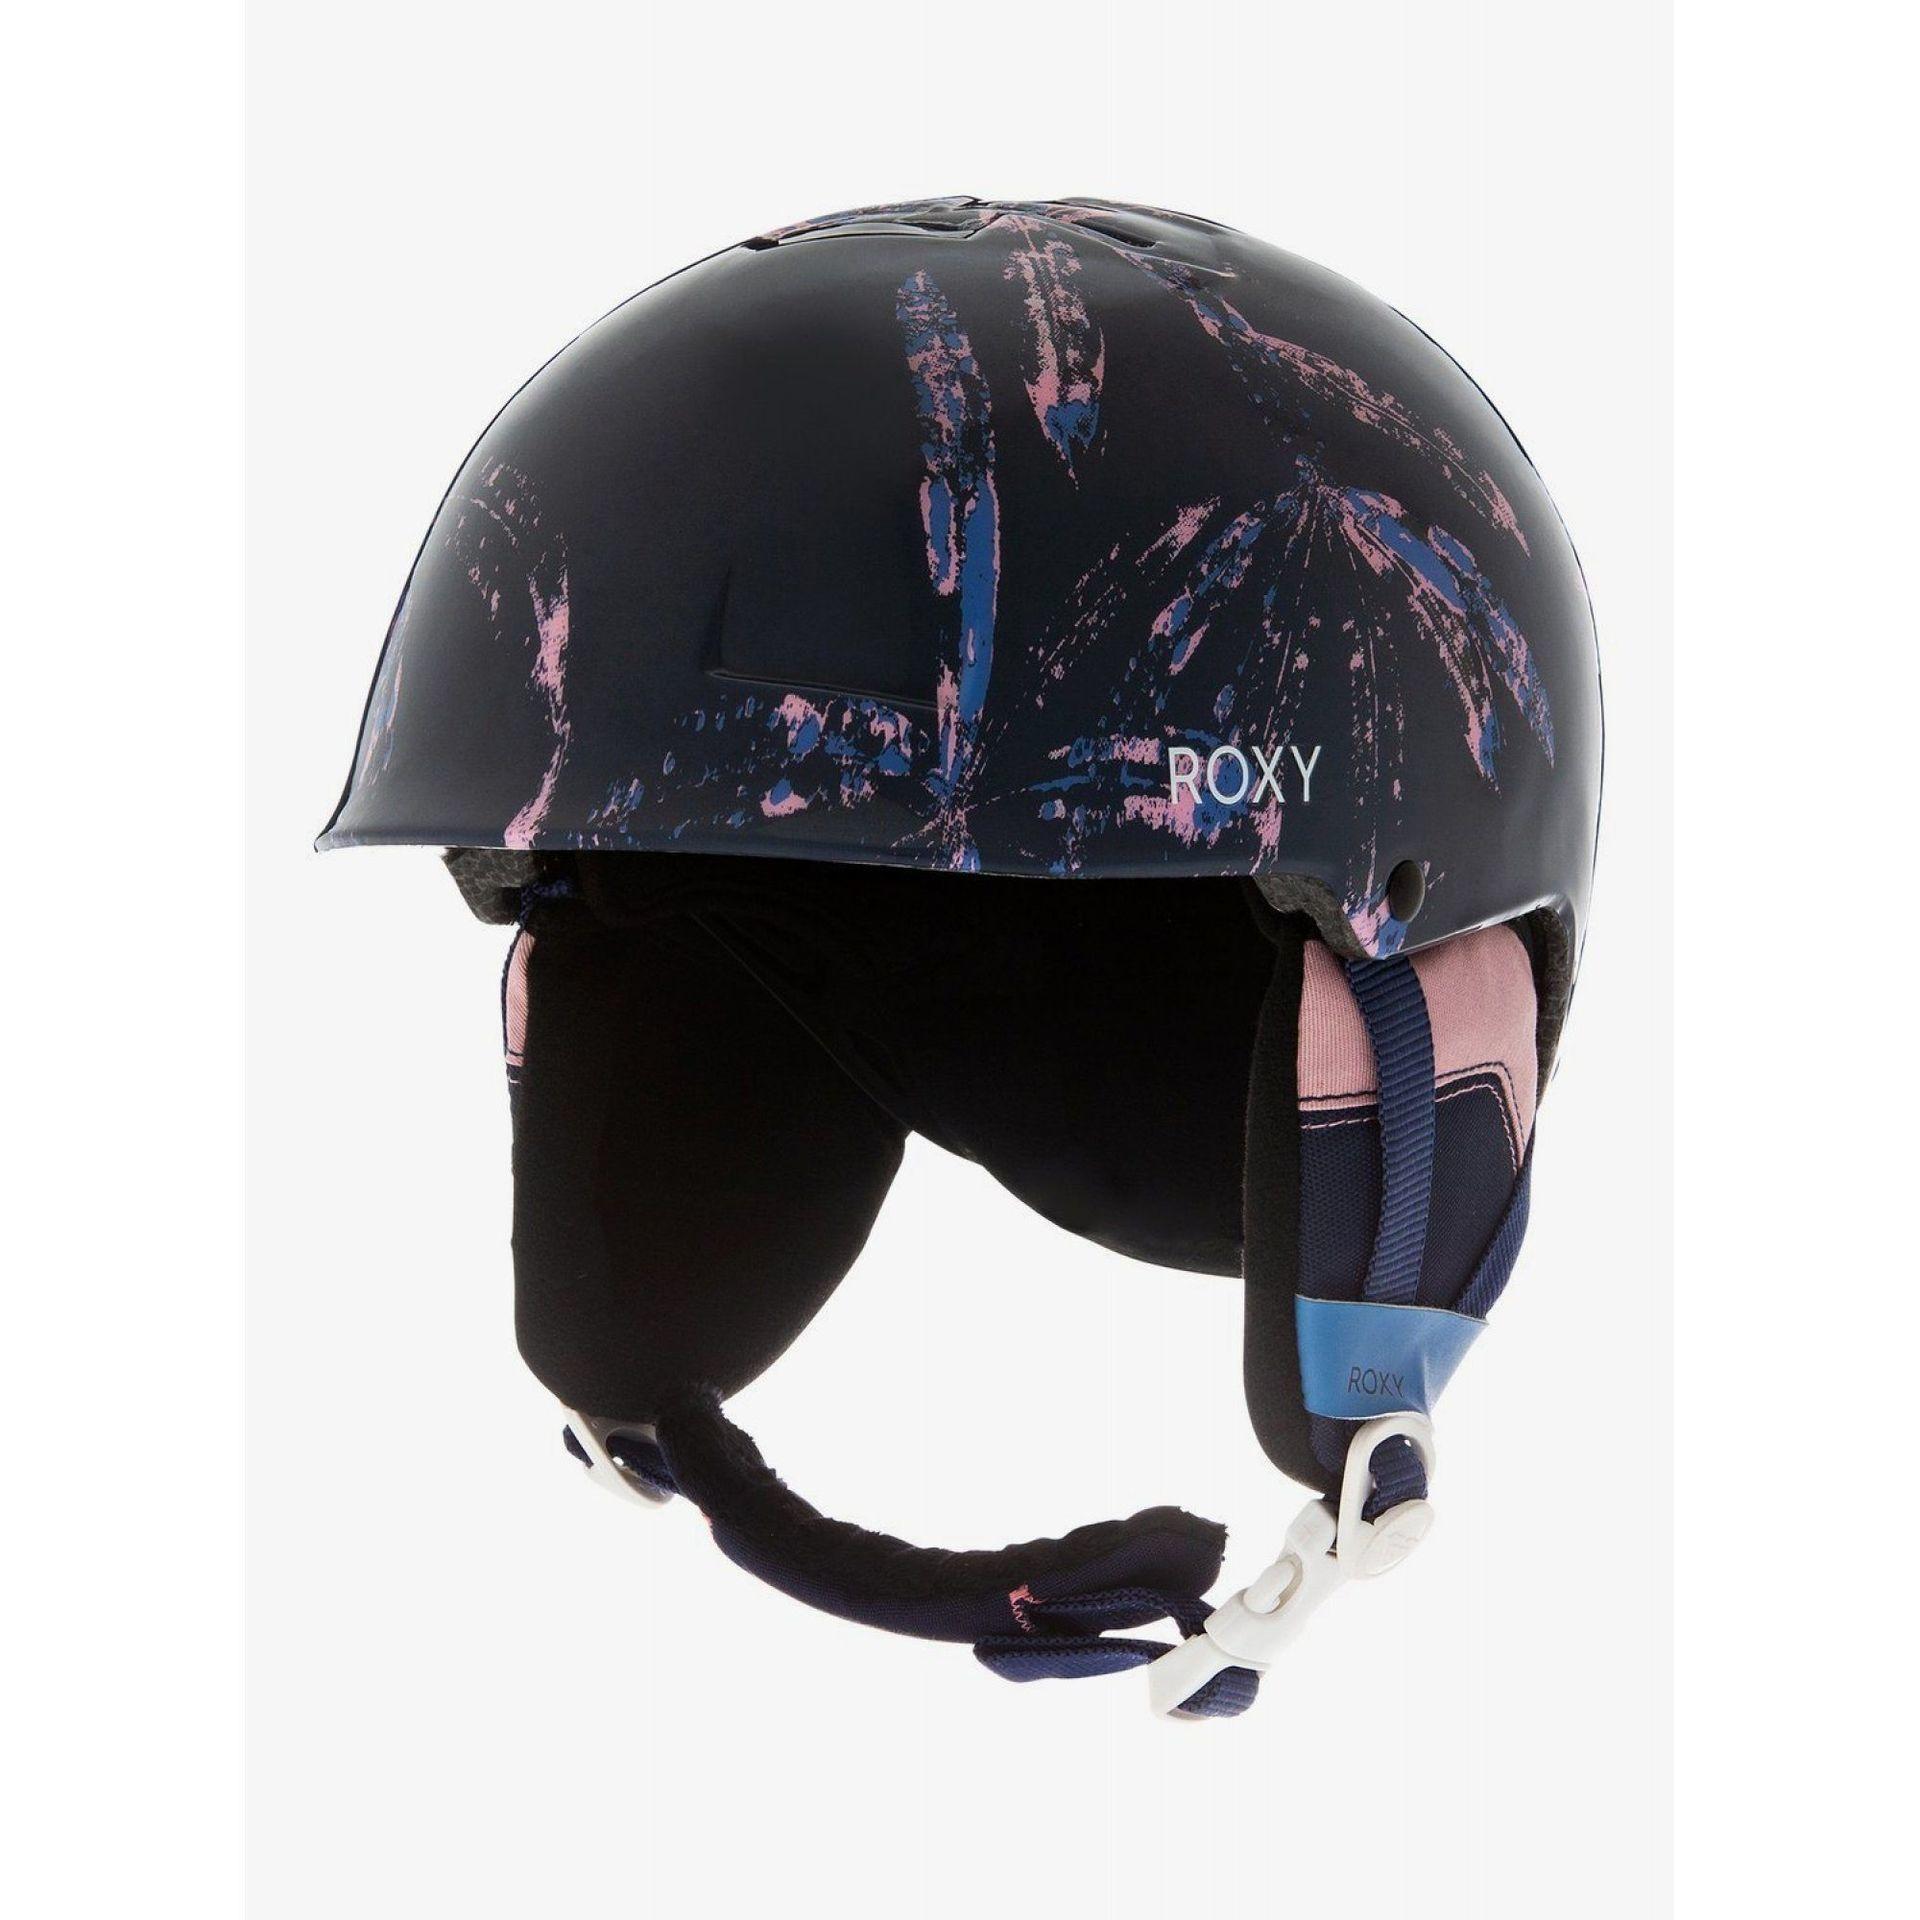 KASK ROXY HAPPYLAND ERGTL03016-BTE6 MEDIEVAL BLUE ARCTIC LEAVES